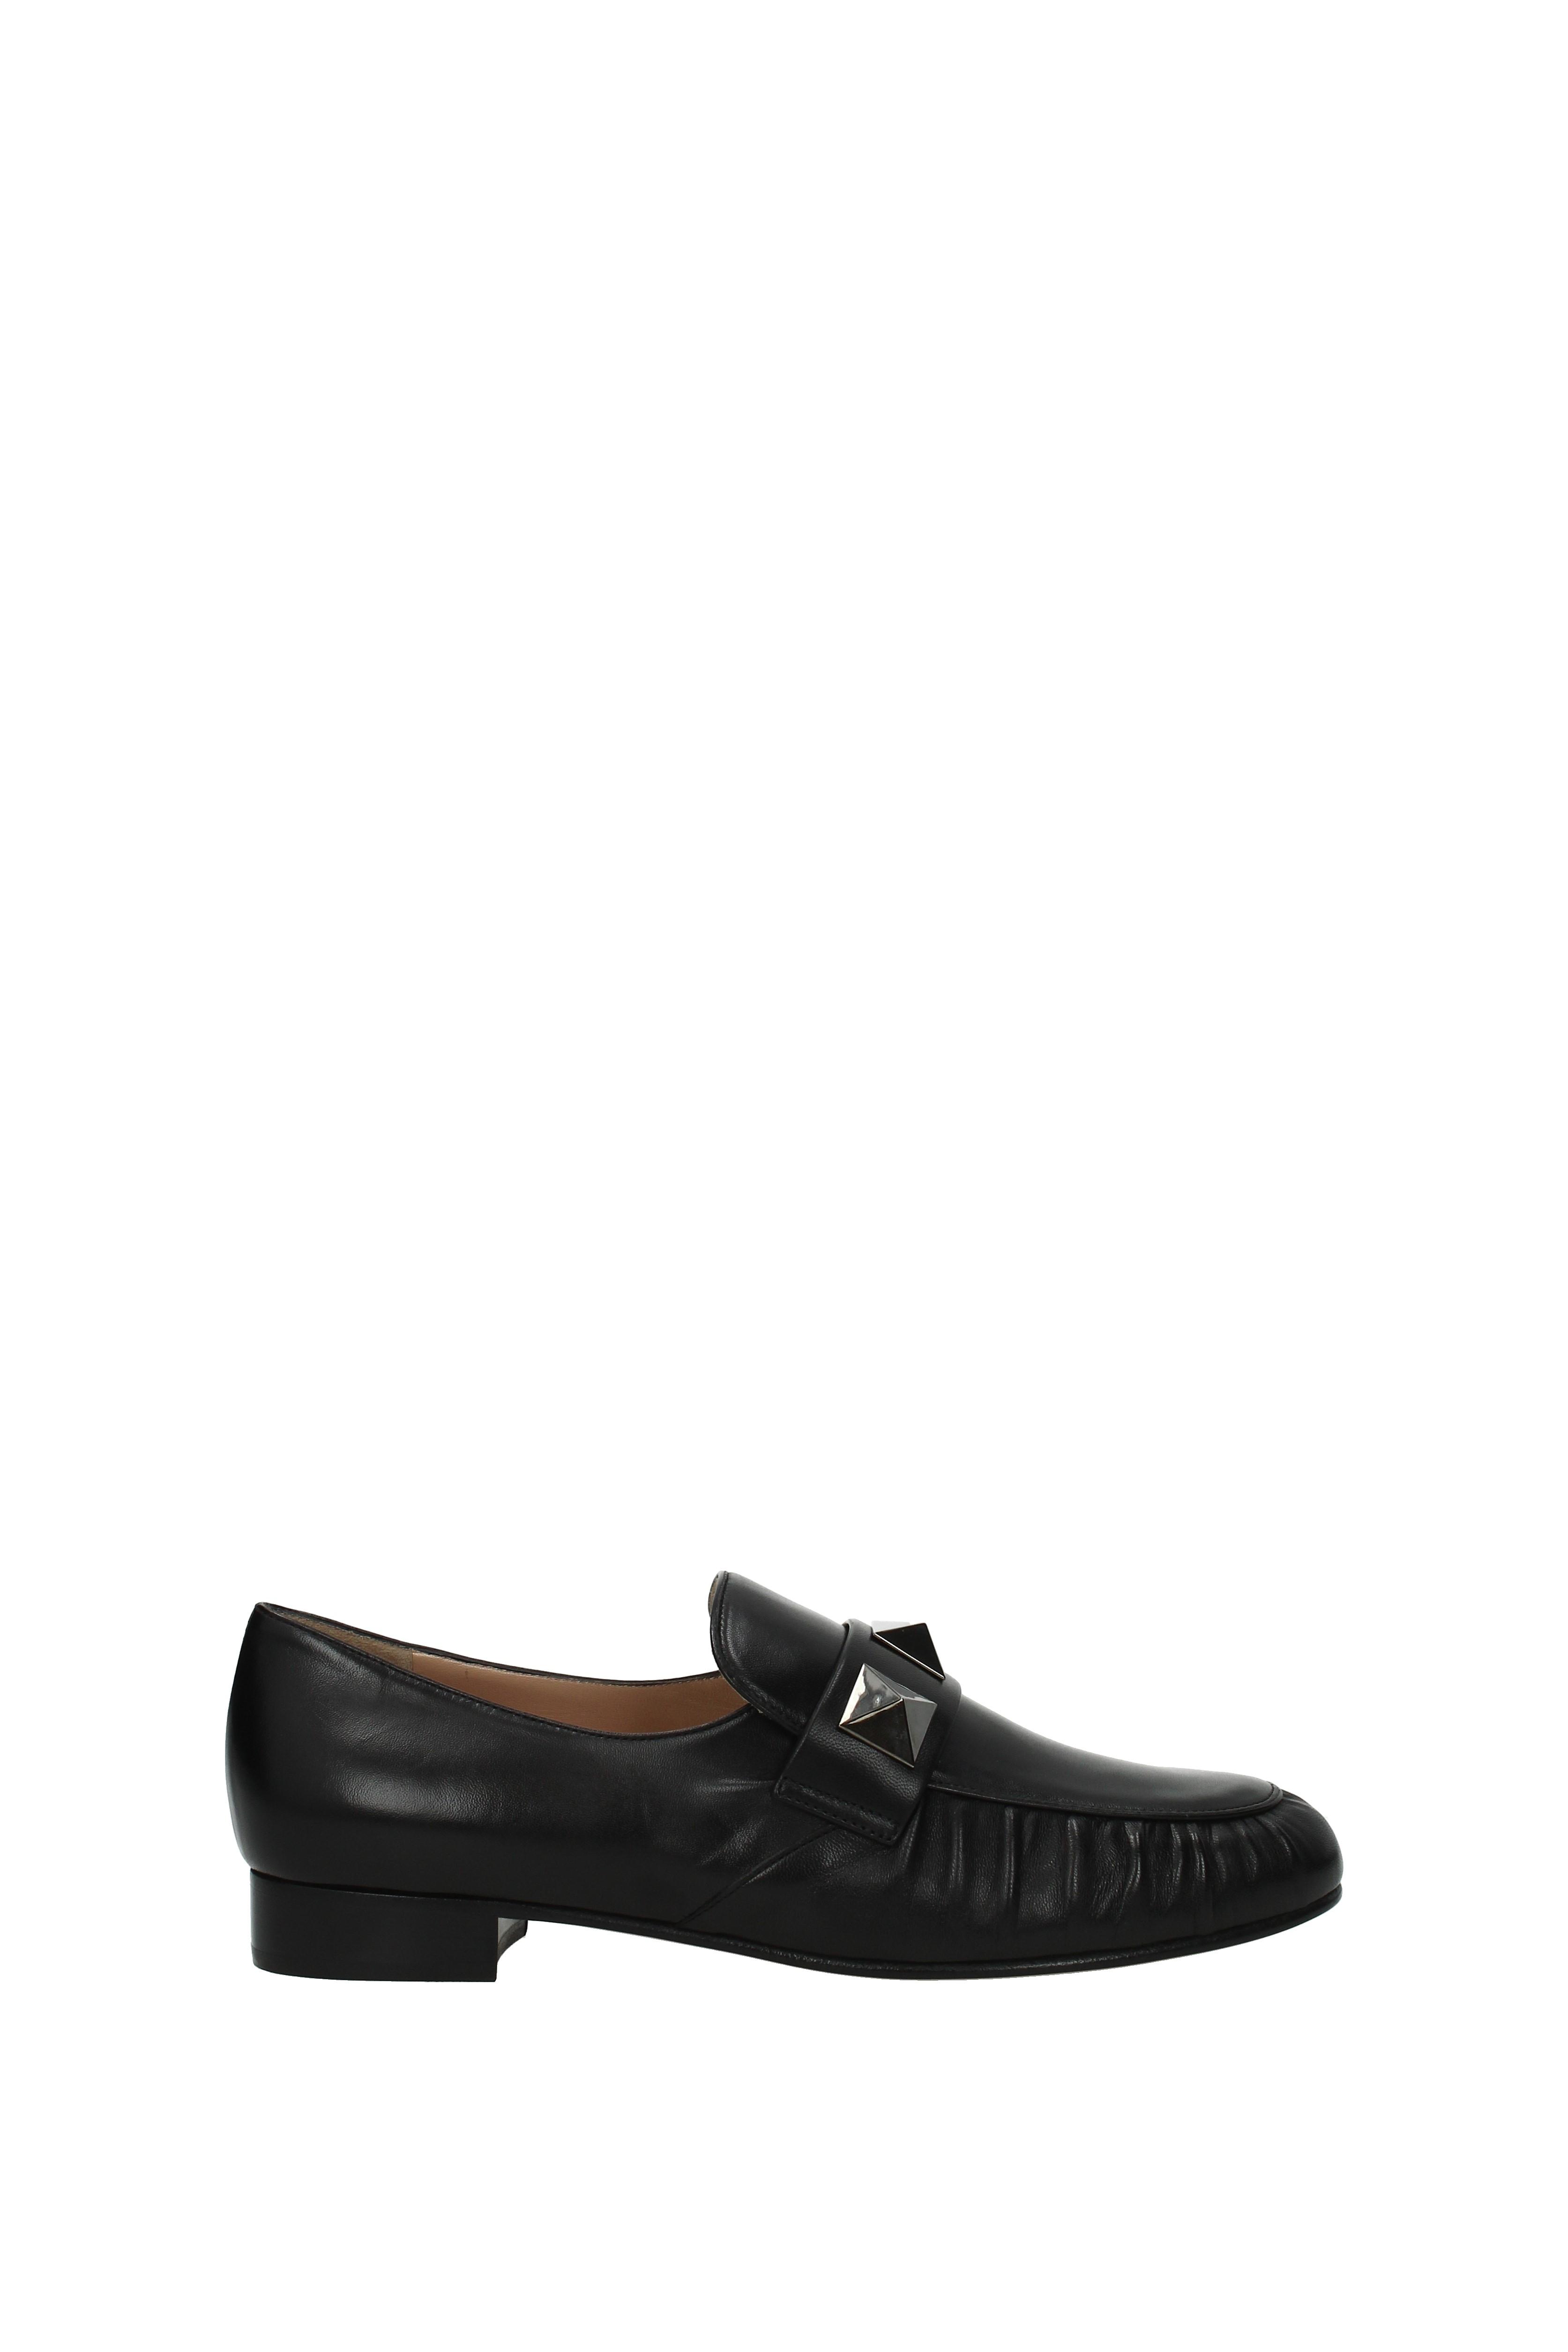 Flip-Flops und Holzschuhe Valentino Garavani Damen Damen Damen - Leder (1S0D22VRI) 614c66